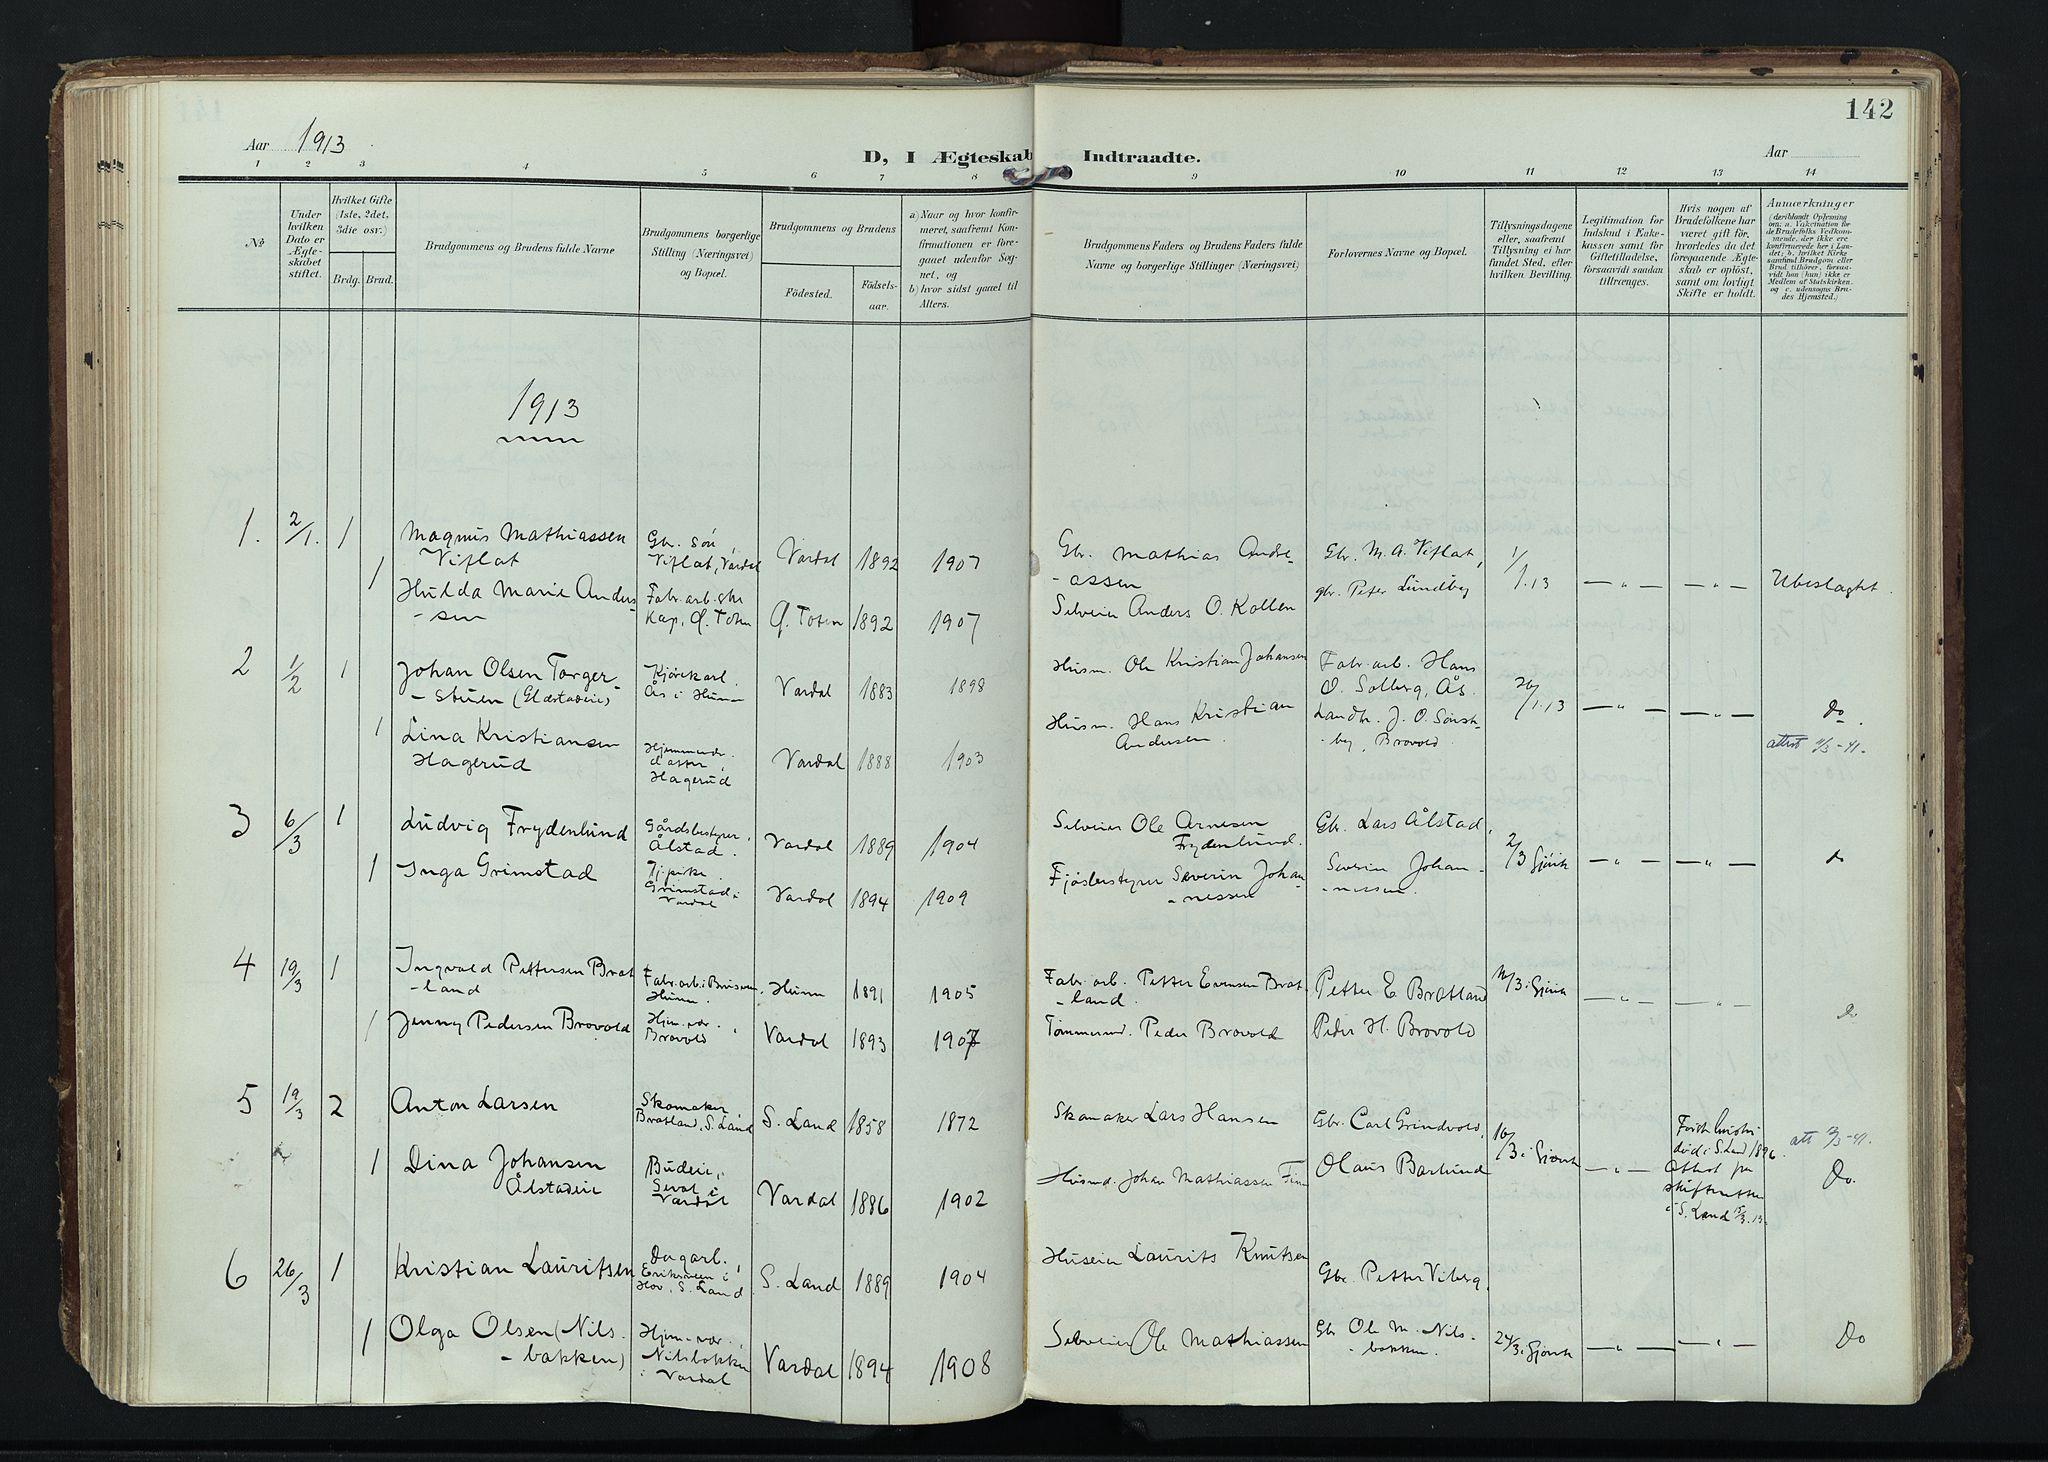 SAH, Vardal prestekontor, H/Ha/Haa/L0020: Ministerialbok nr. 20, 1907-1921, s. 142